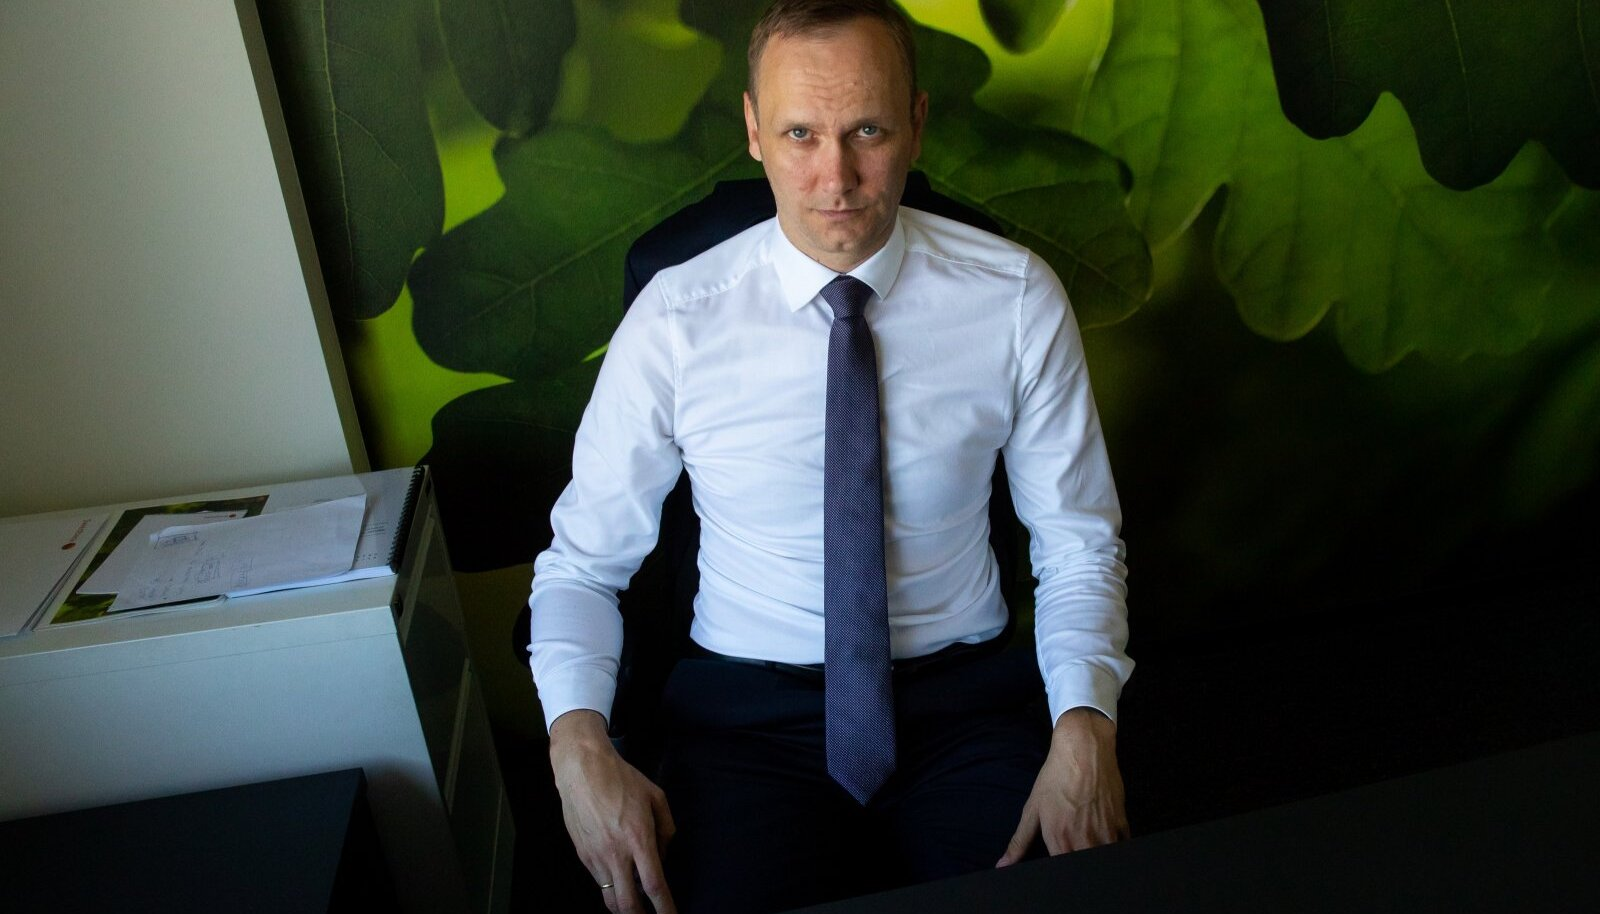 Olavi Lepp